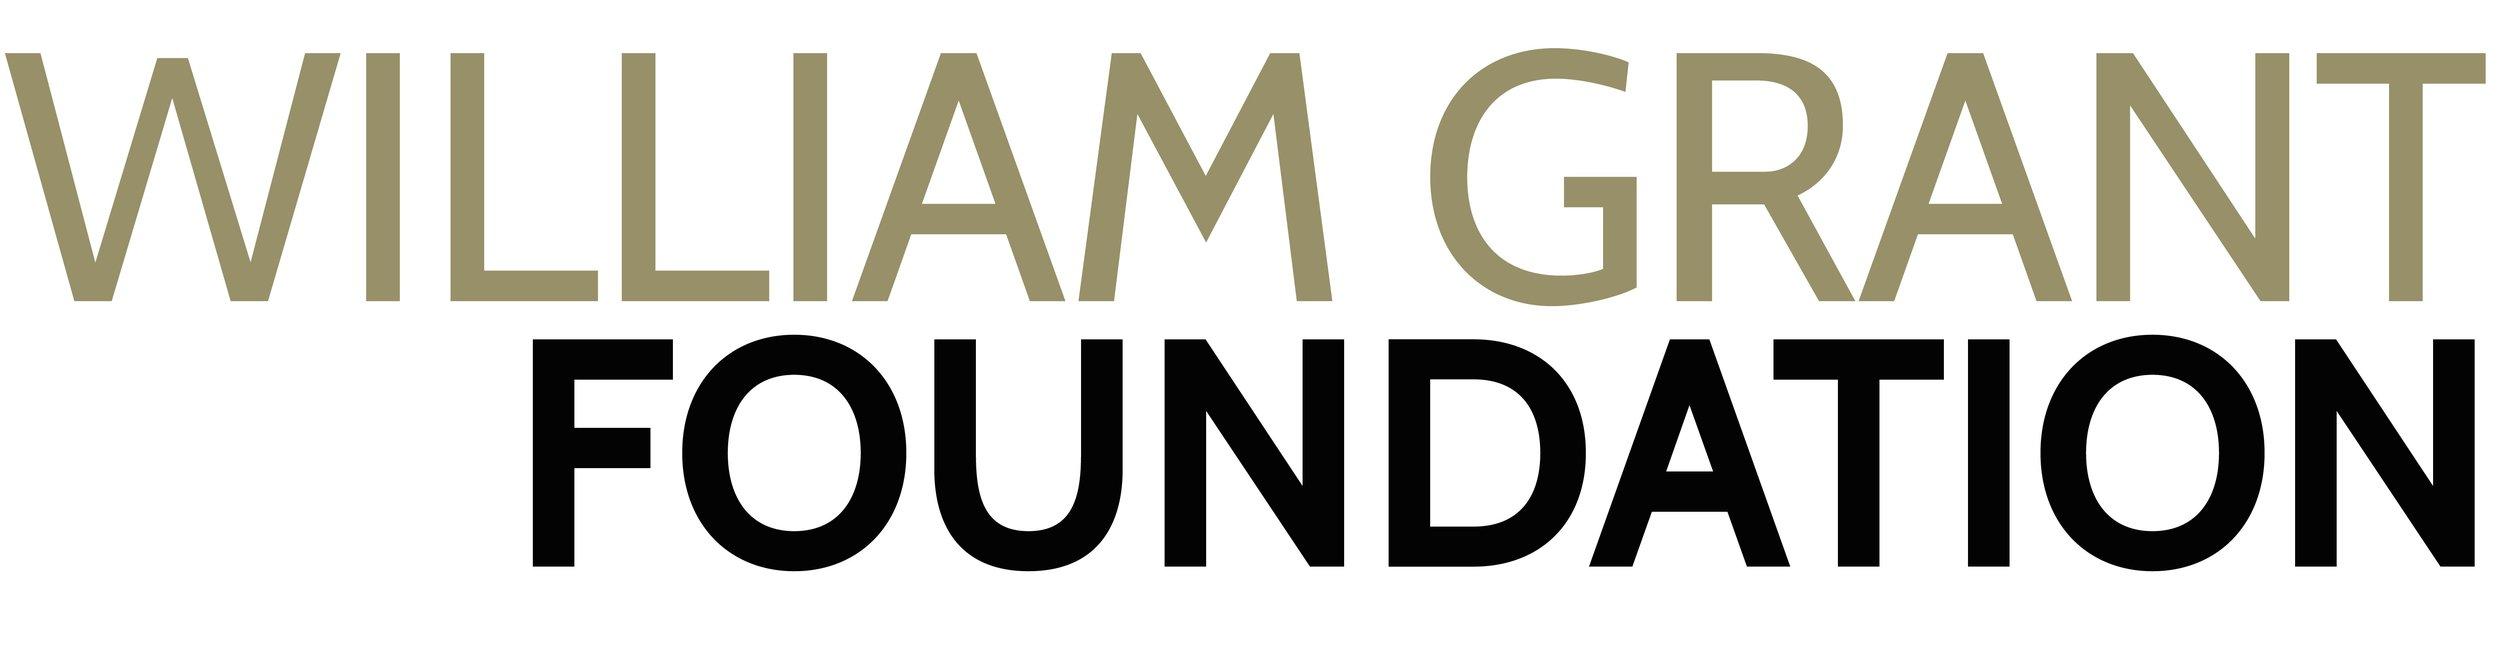 William Grant Foundation LOGO.jpg